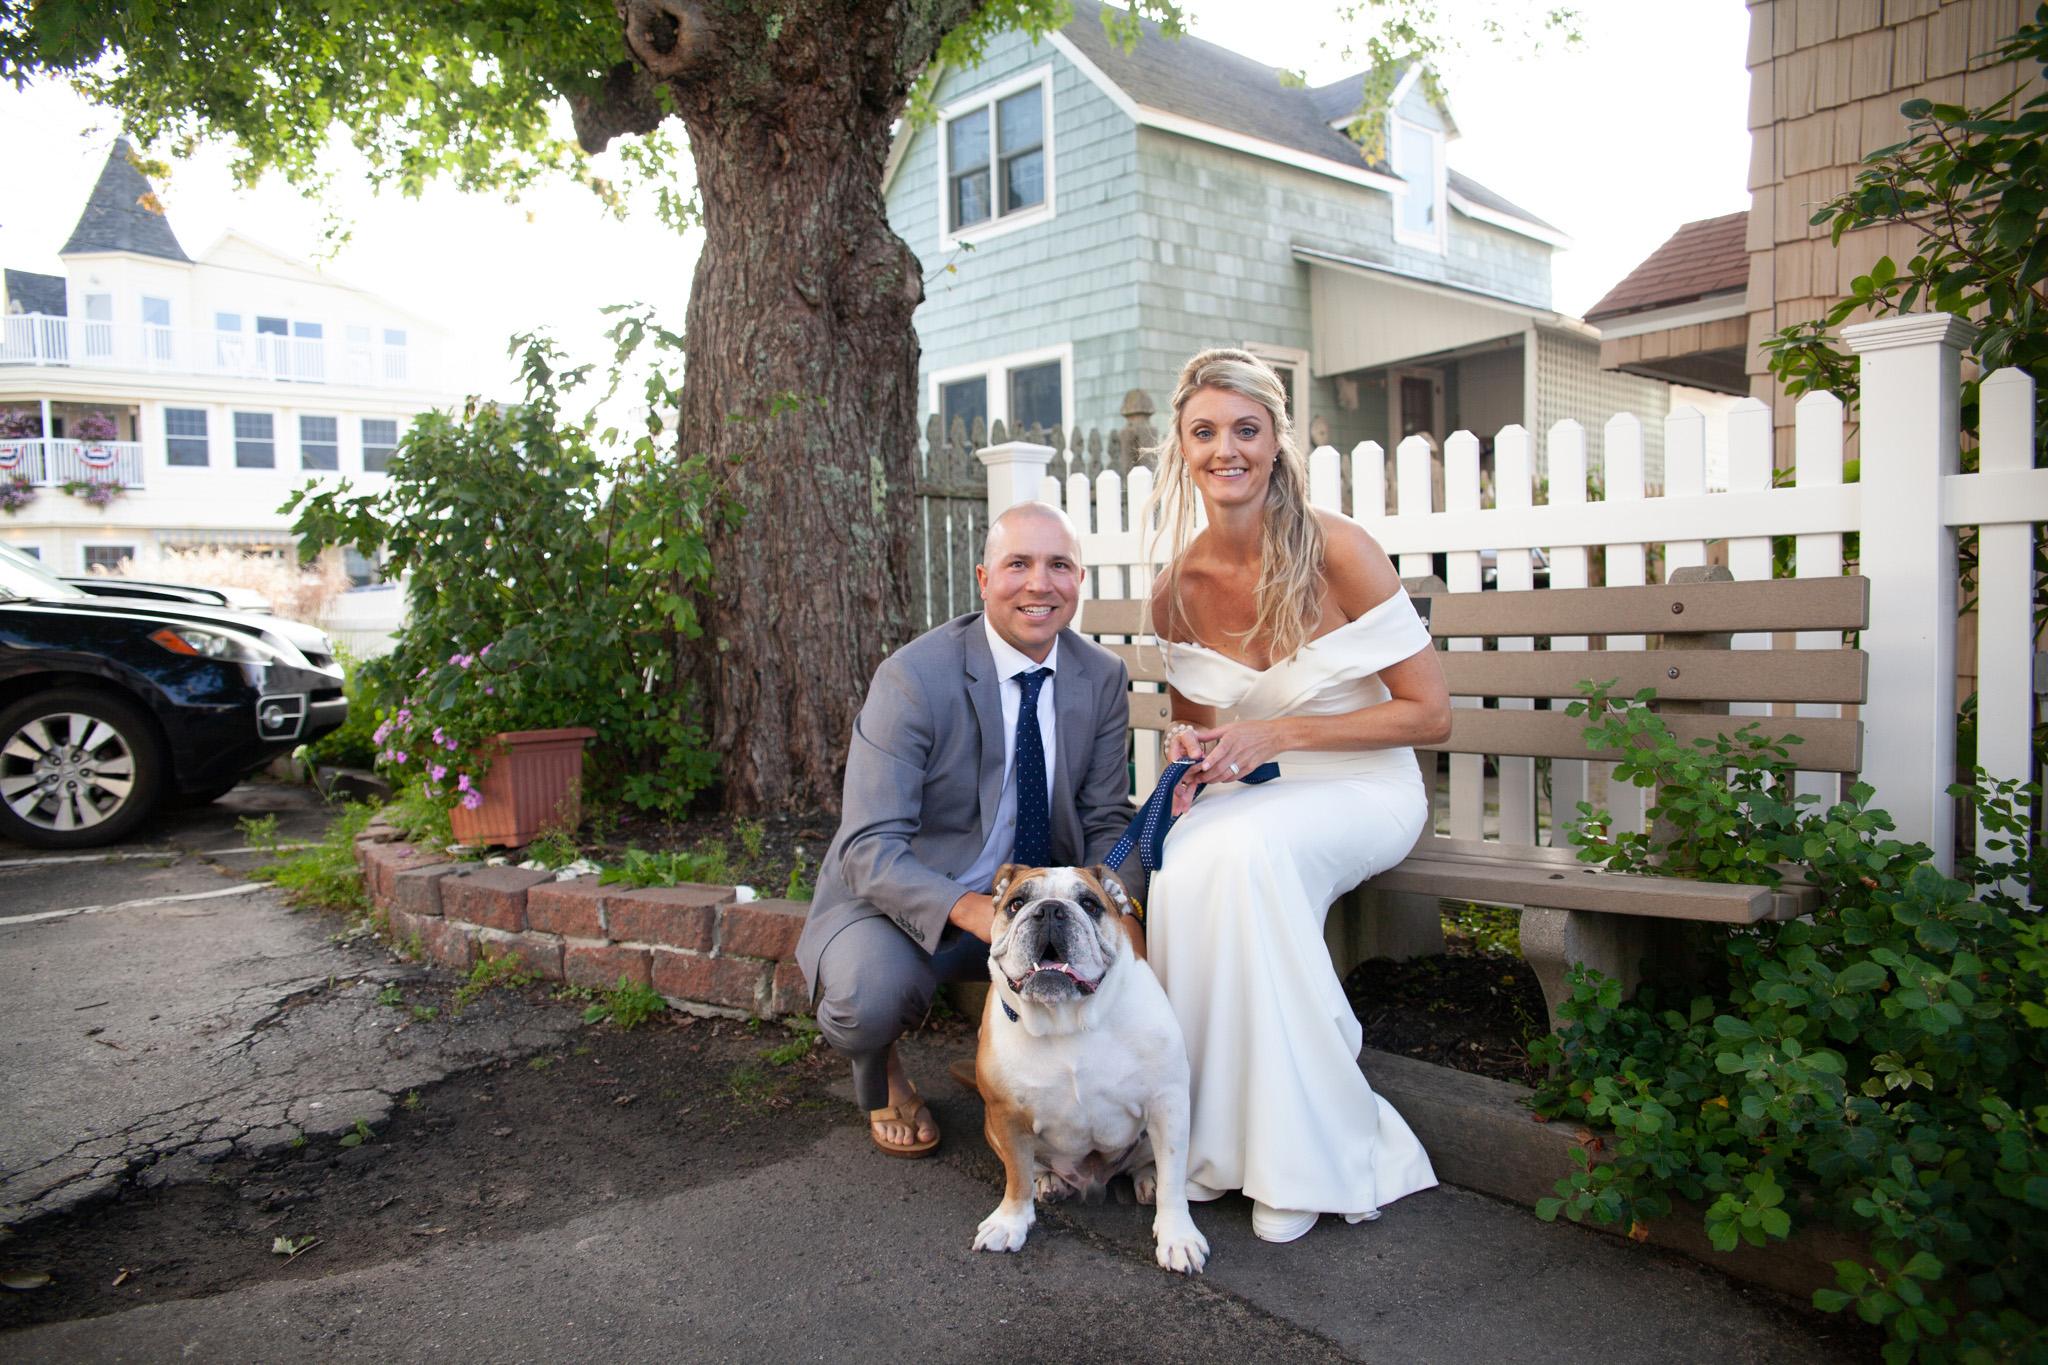 maine-wedding-photographer-ocean-park-stepheneycollinsphotography-67.jpg